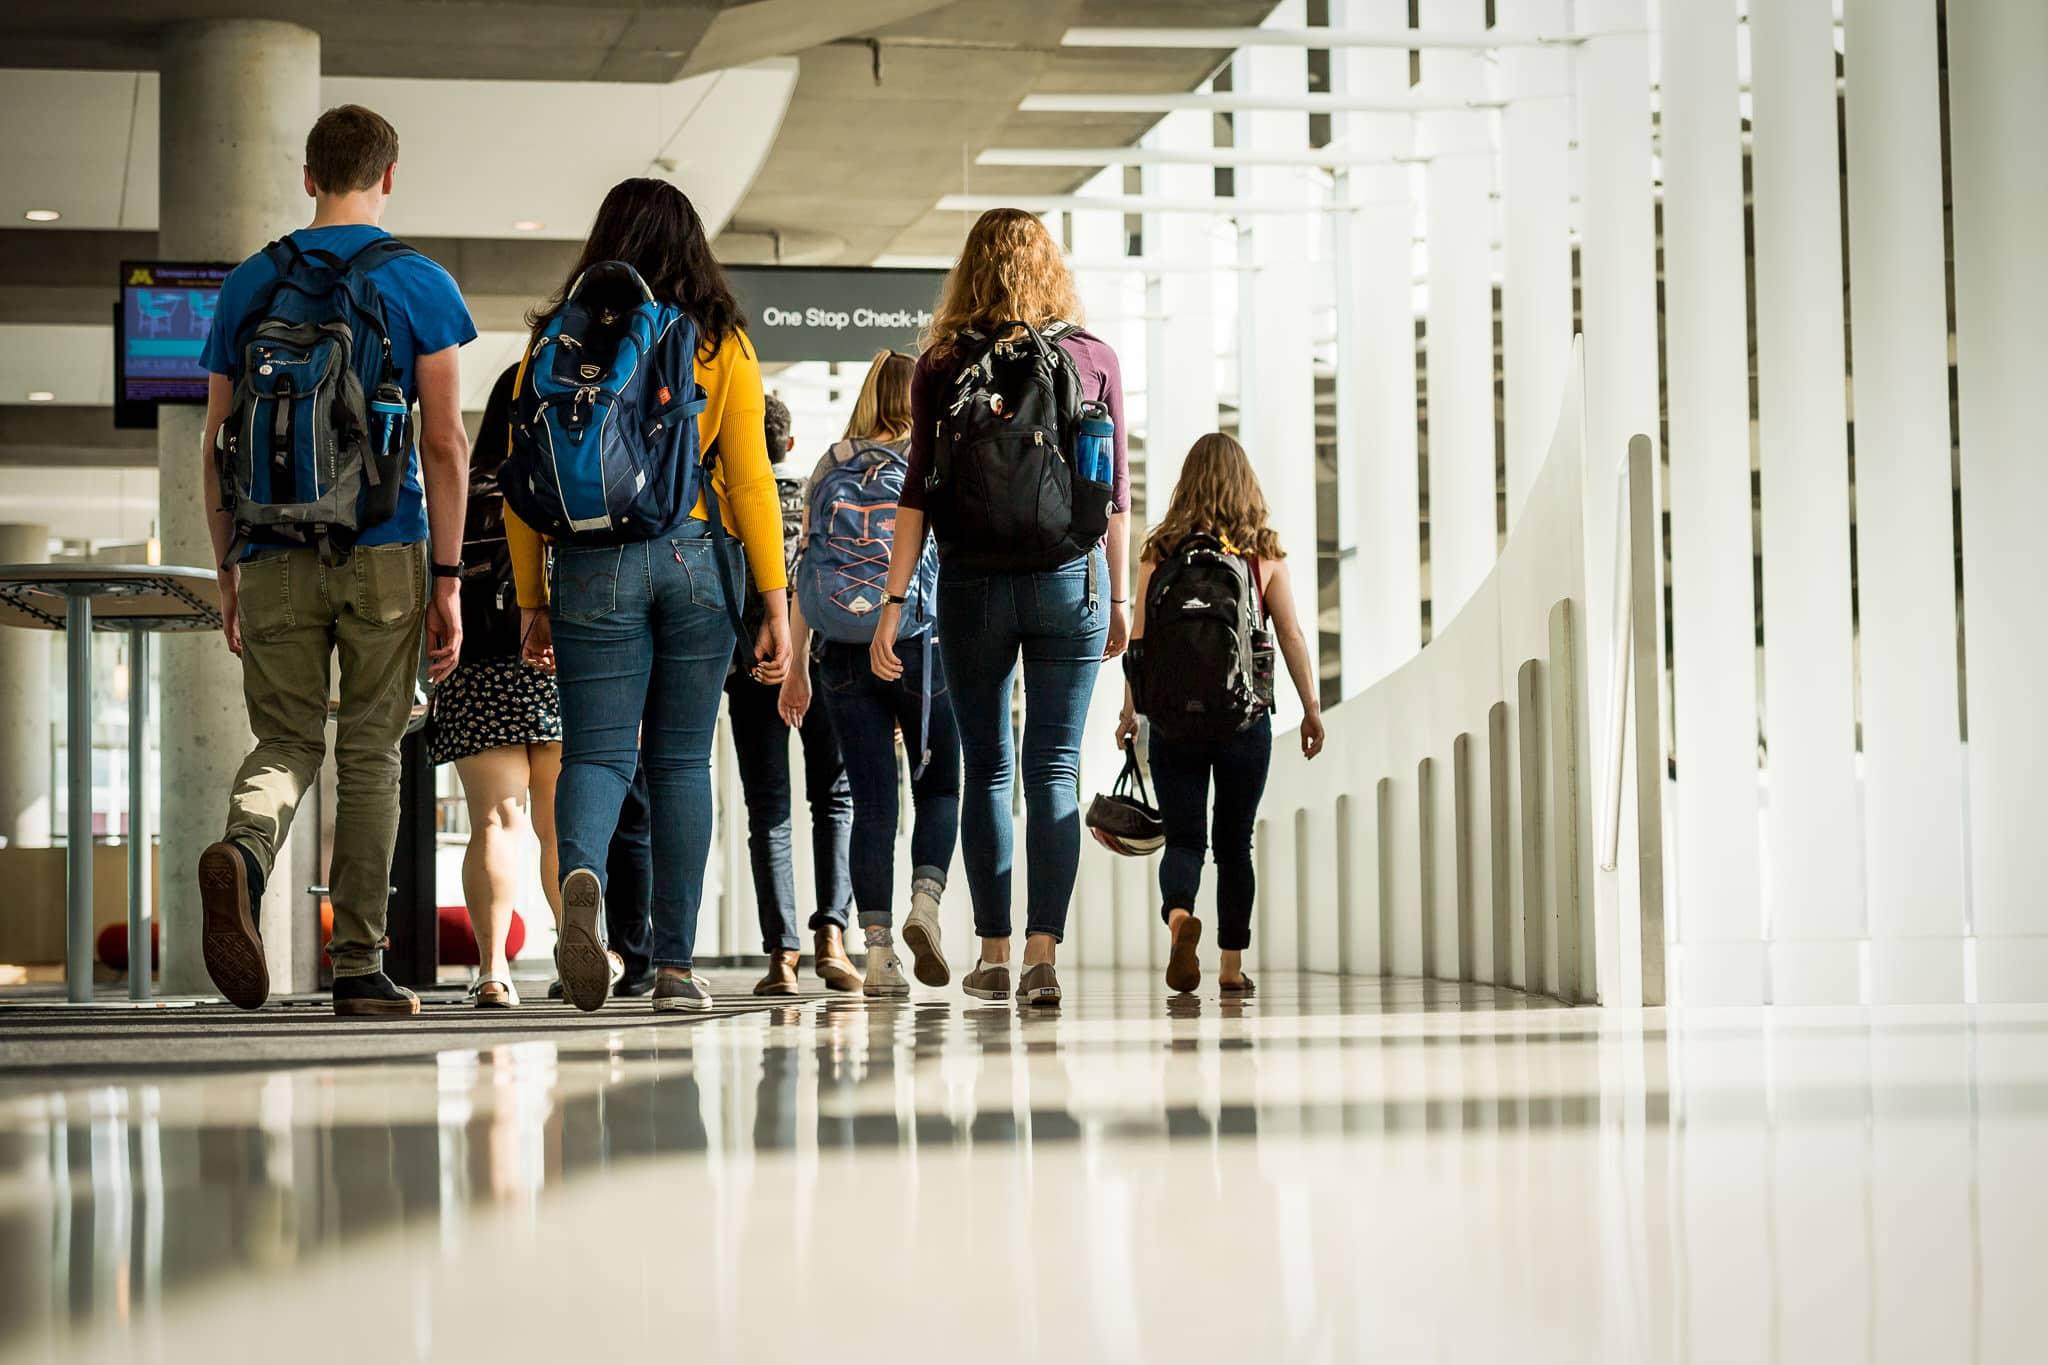 University of Minnesota Biology Students walking between classes